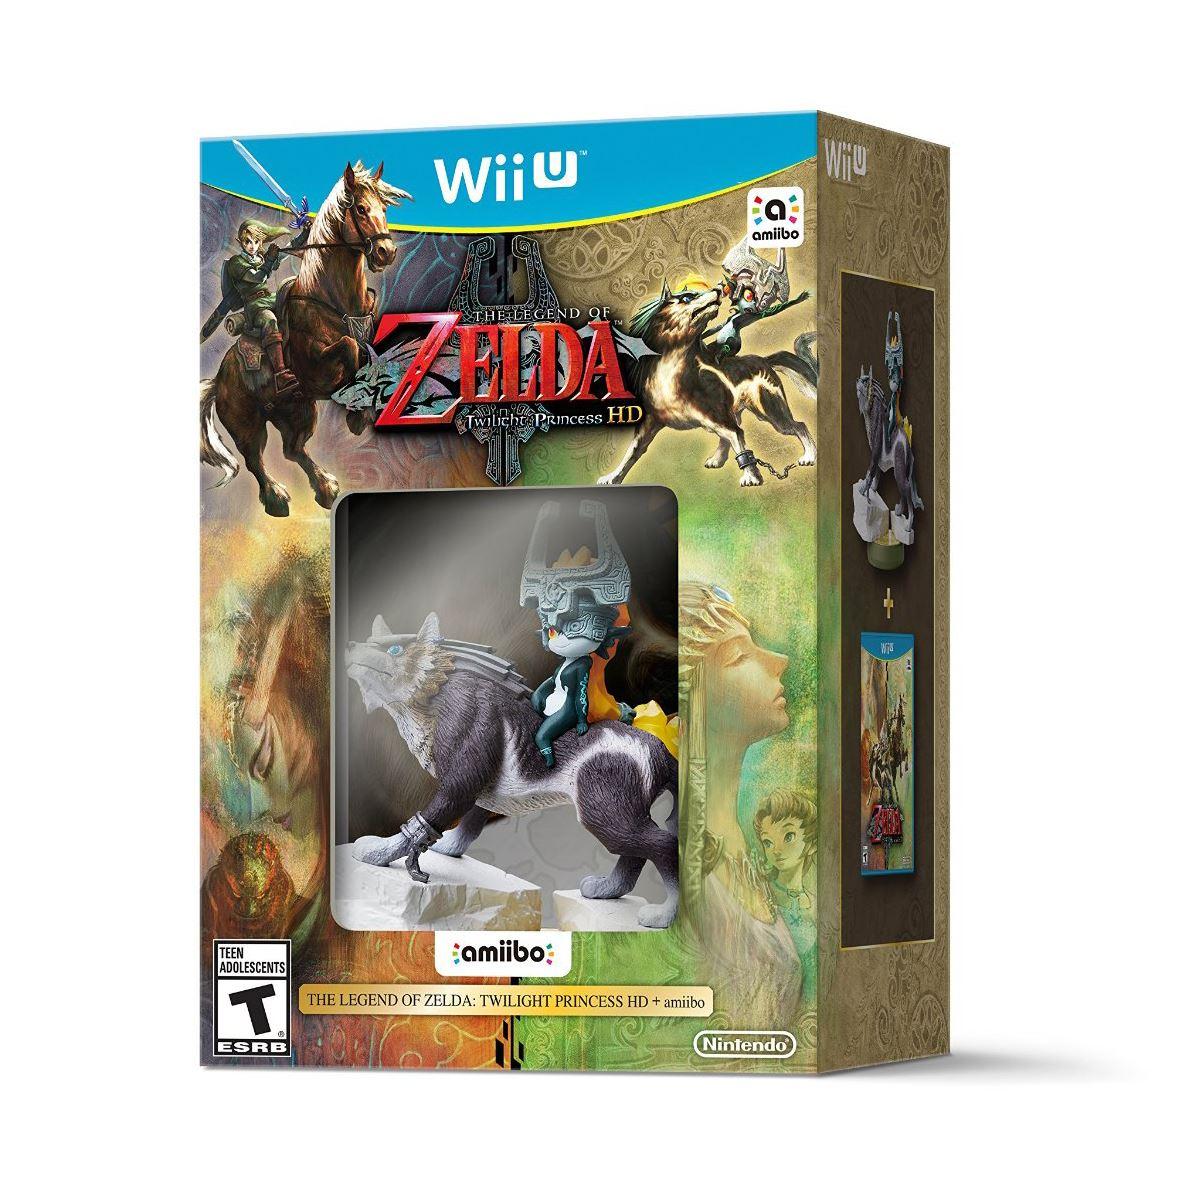 Wii U Legend Of Zelda Twilight Princess HD